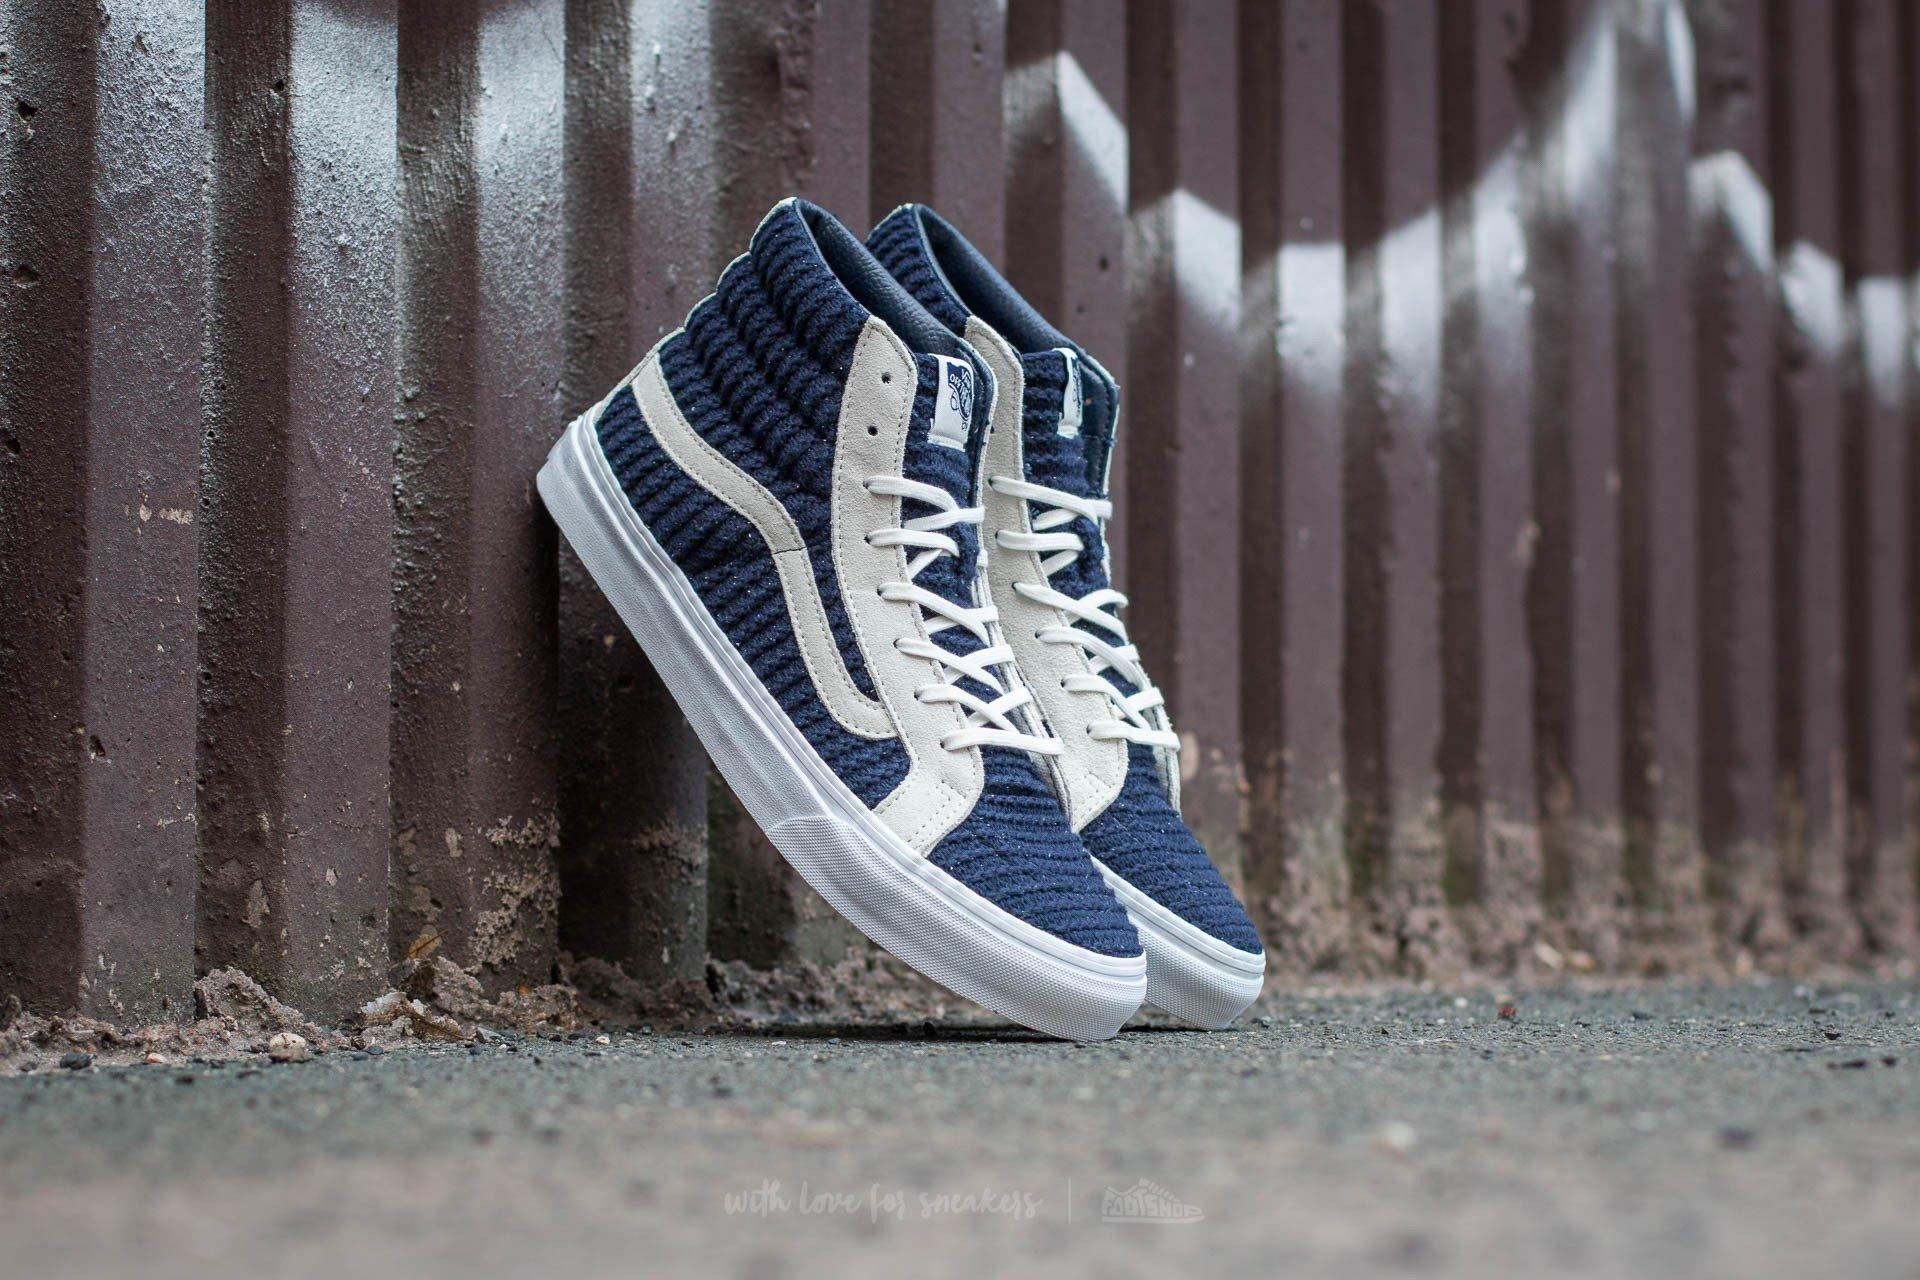 648bac99bdfb49 Vans Sk8-Hi Slim (Suede  Woven) Navy Blue  True White